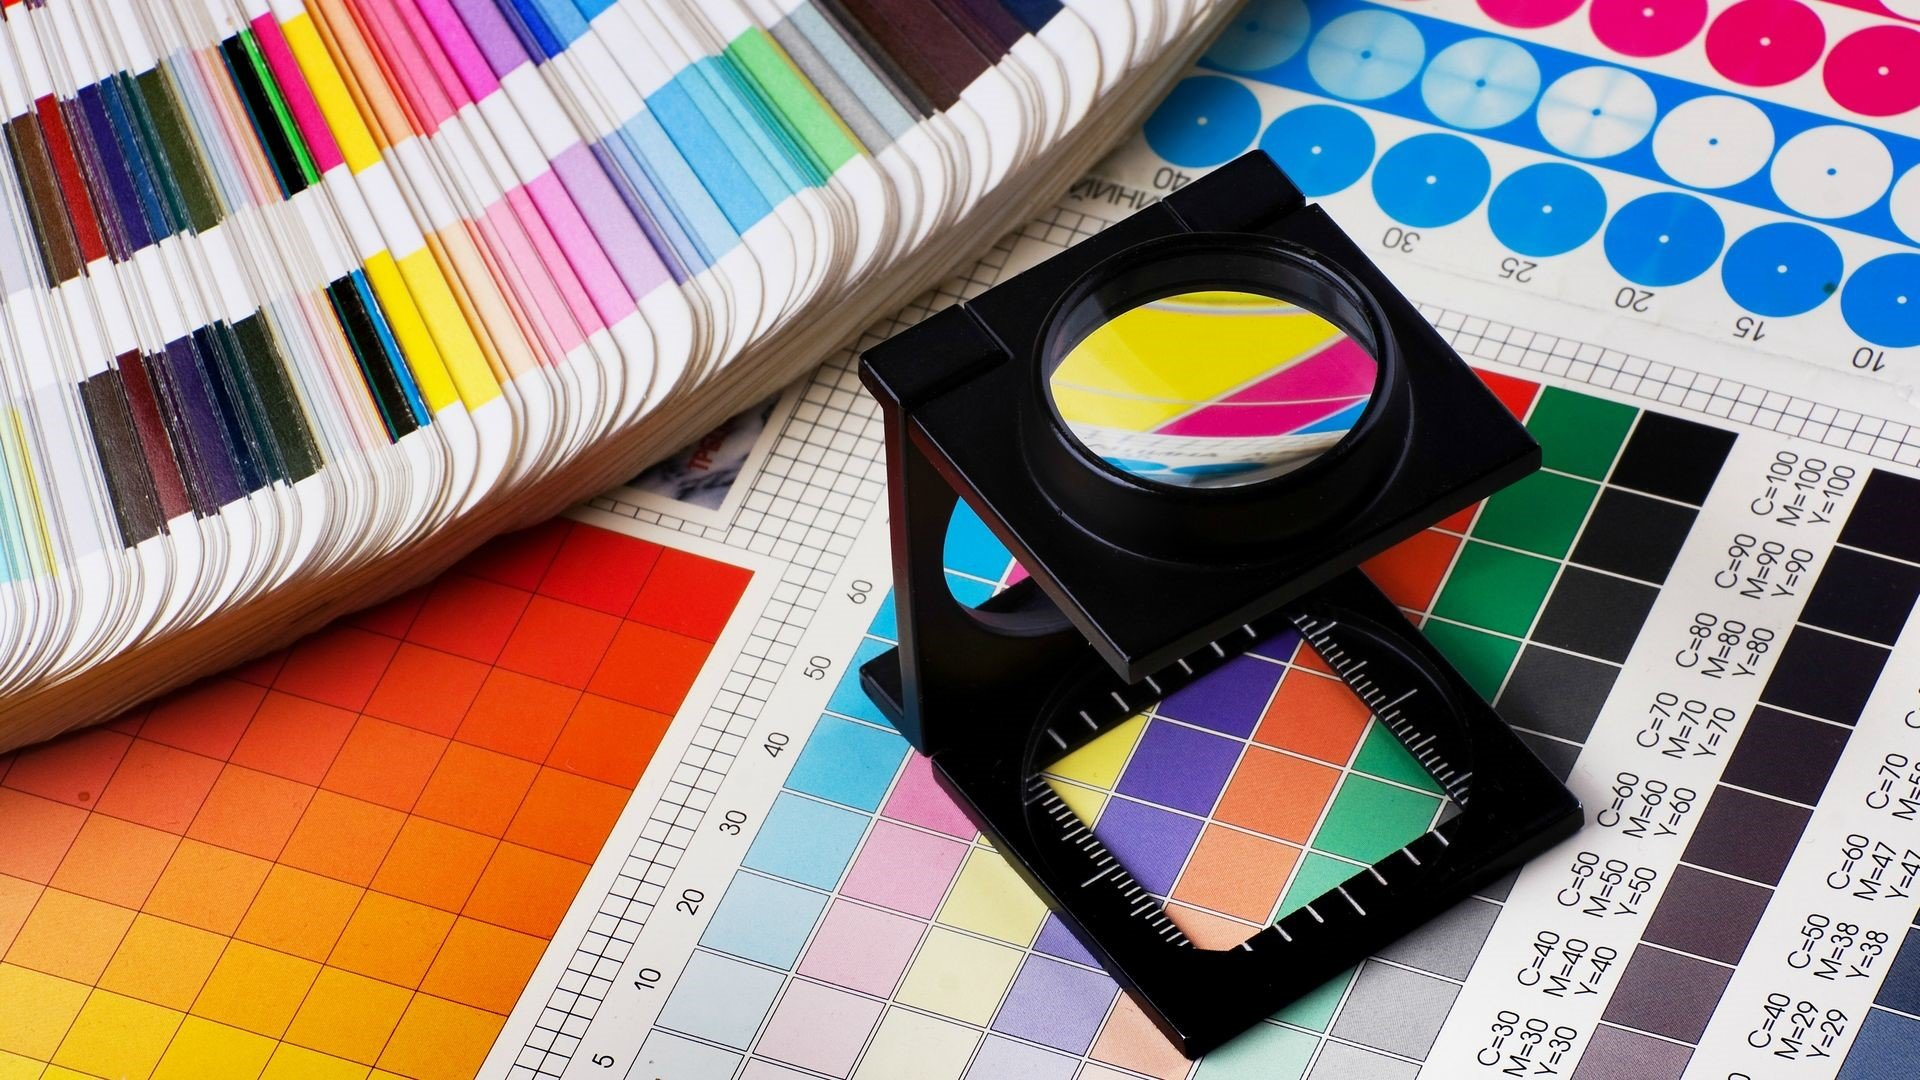 Free HD Desktop Wallpapers 70